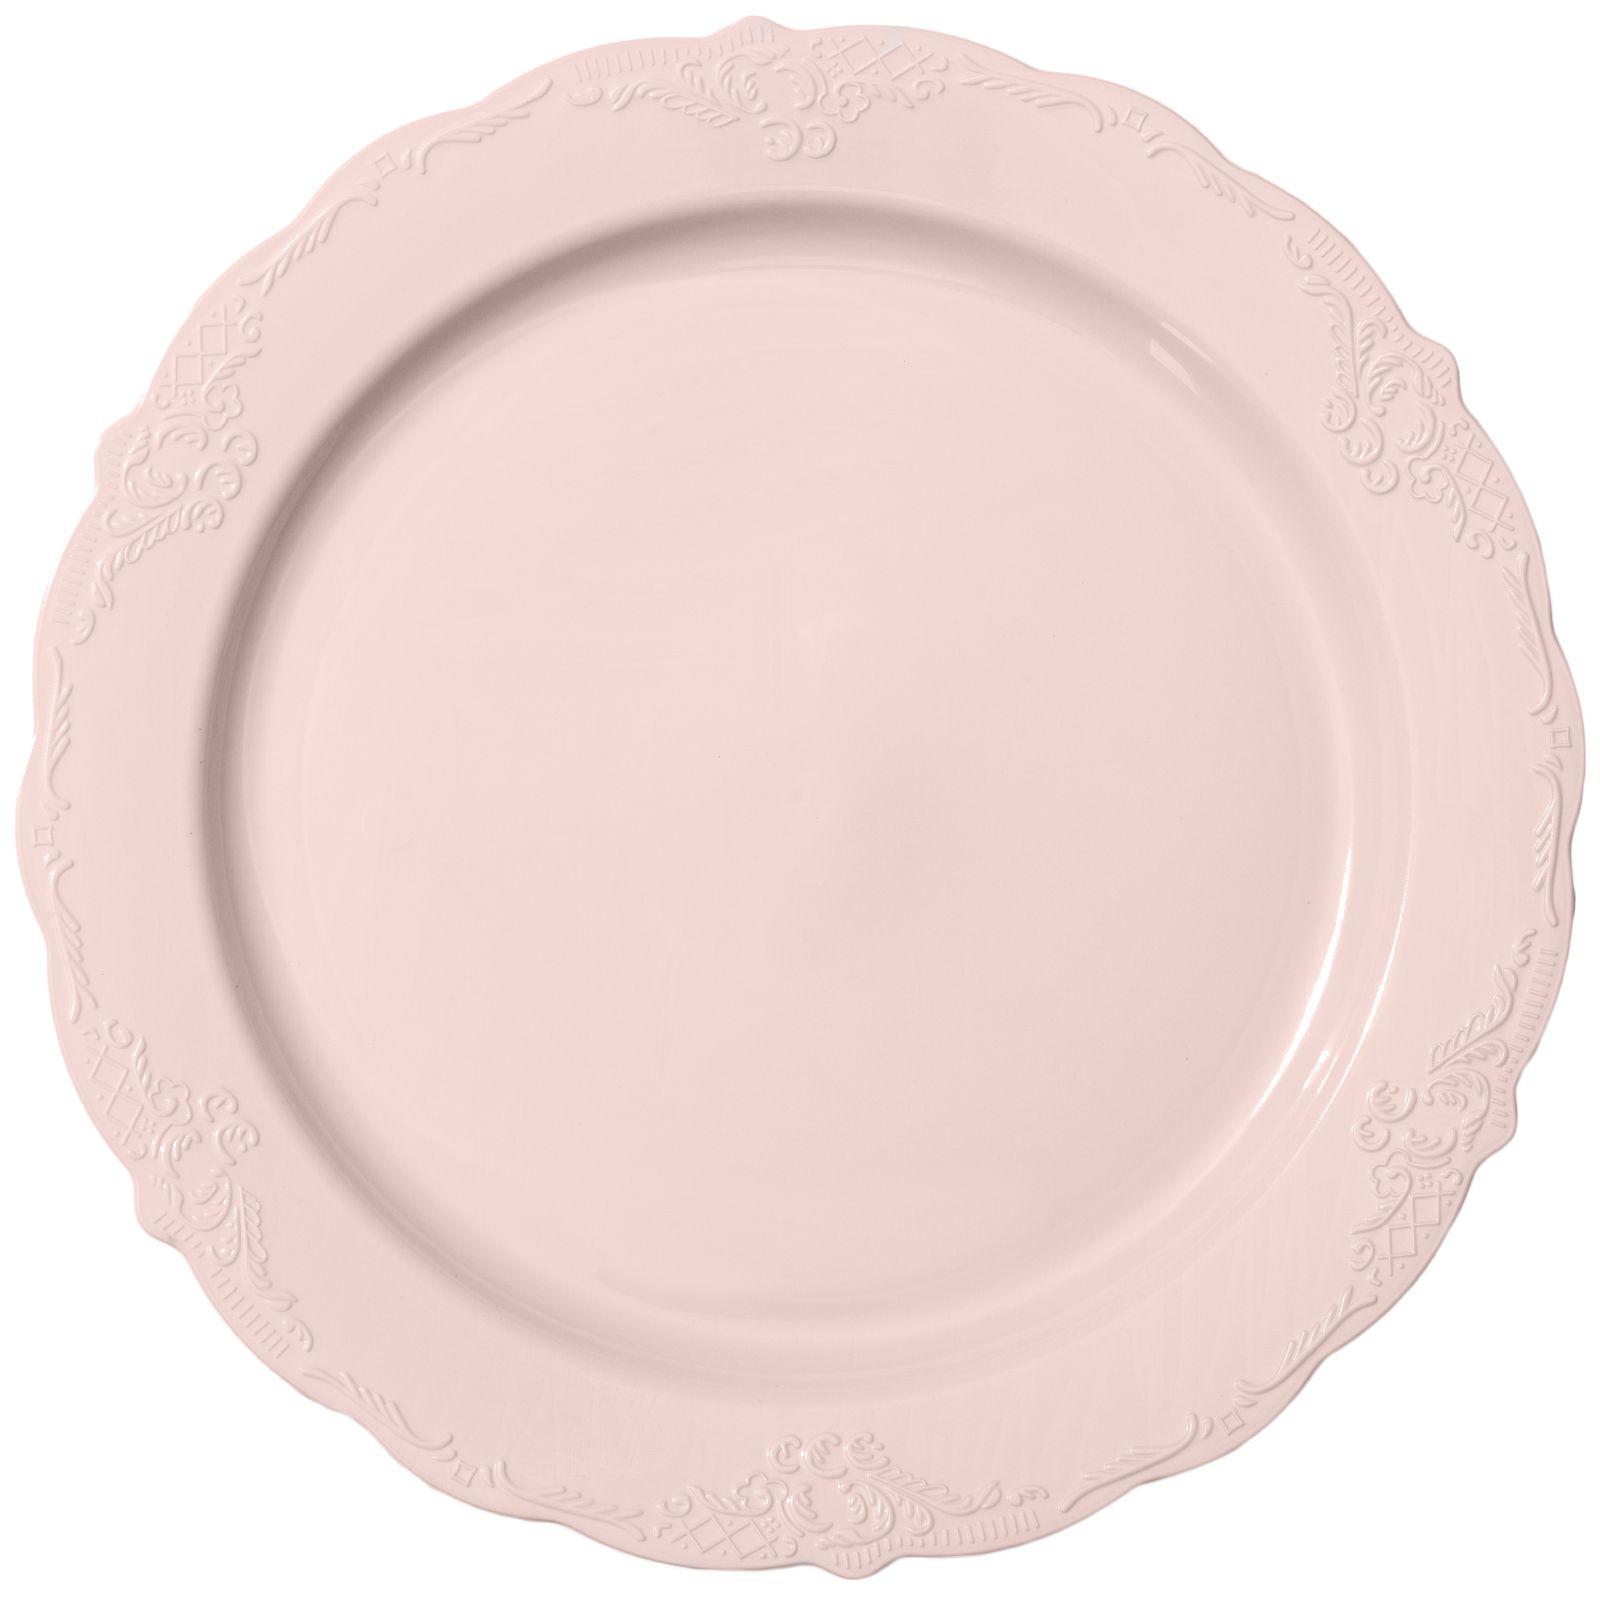 wedding cake plates disposable